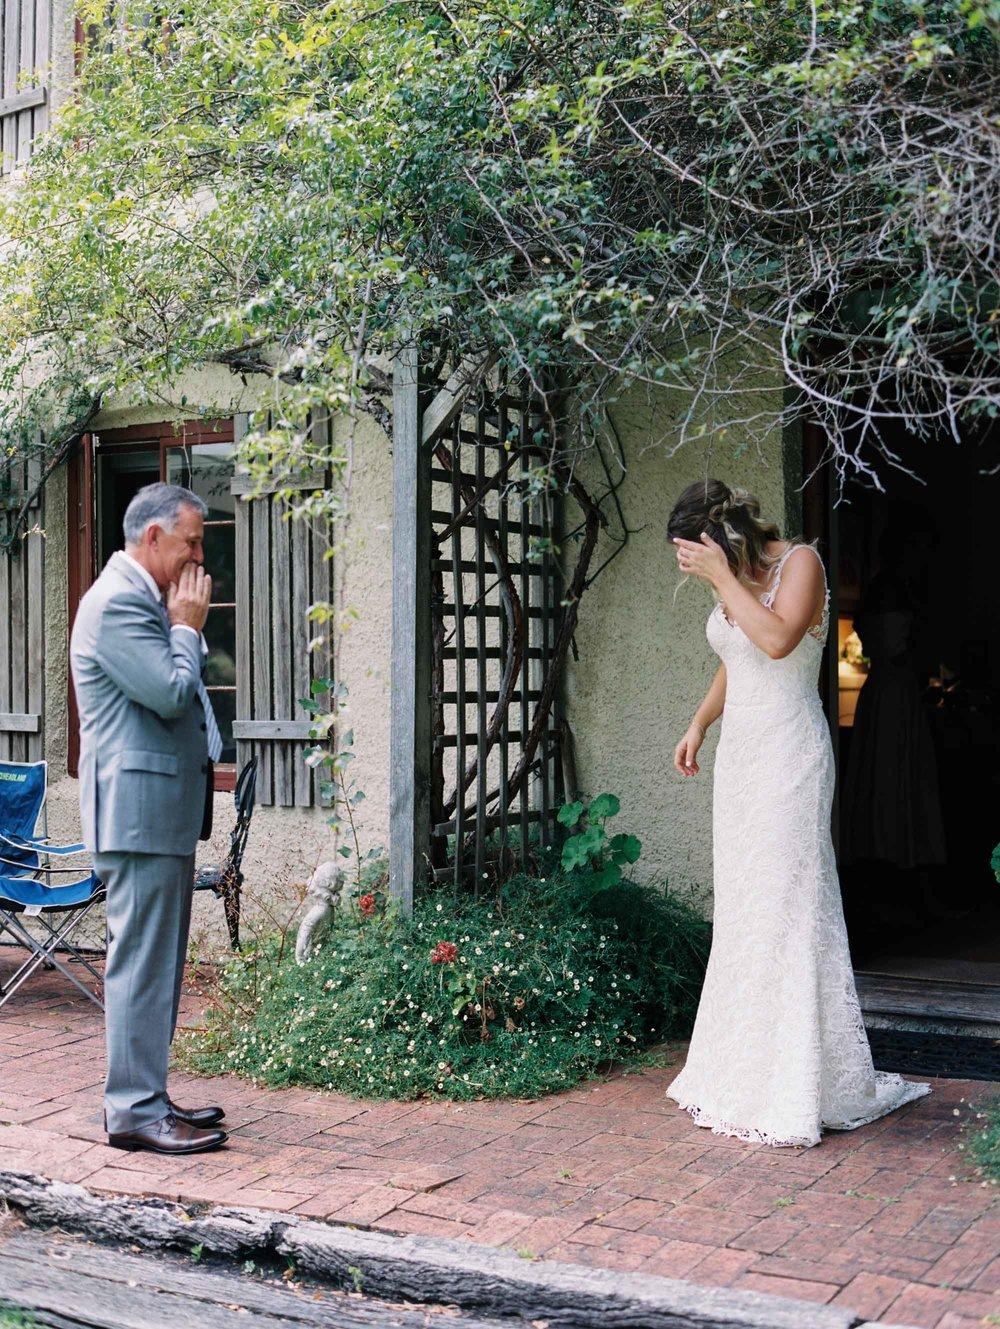 Golding-Wines-wedding-photography-035.jpg